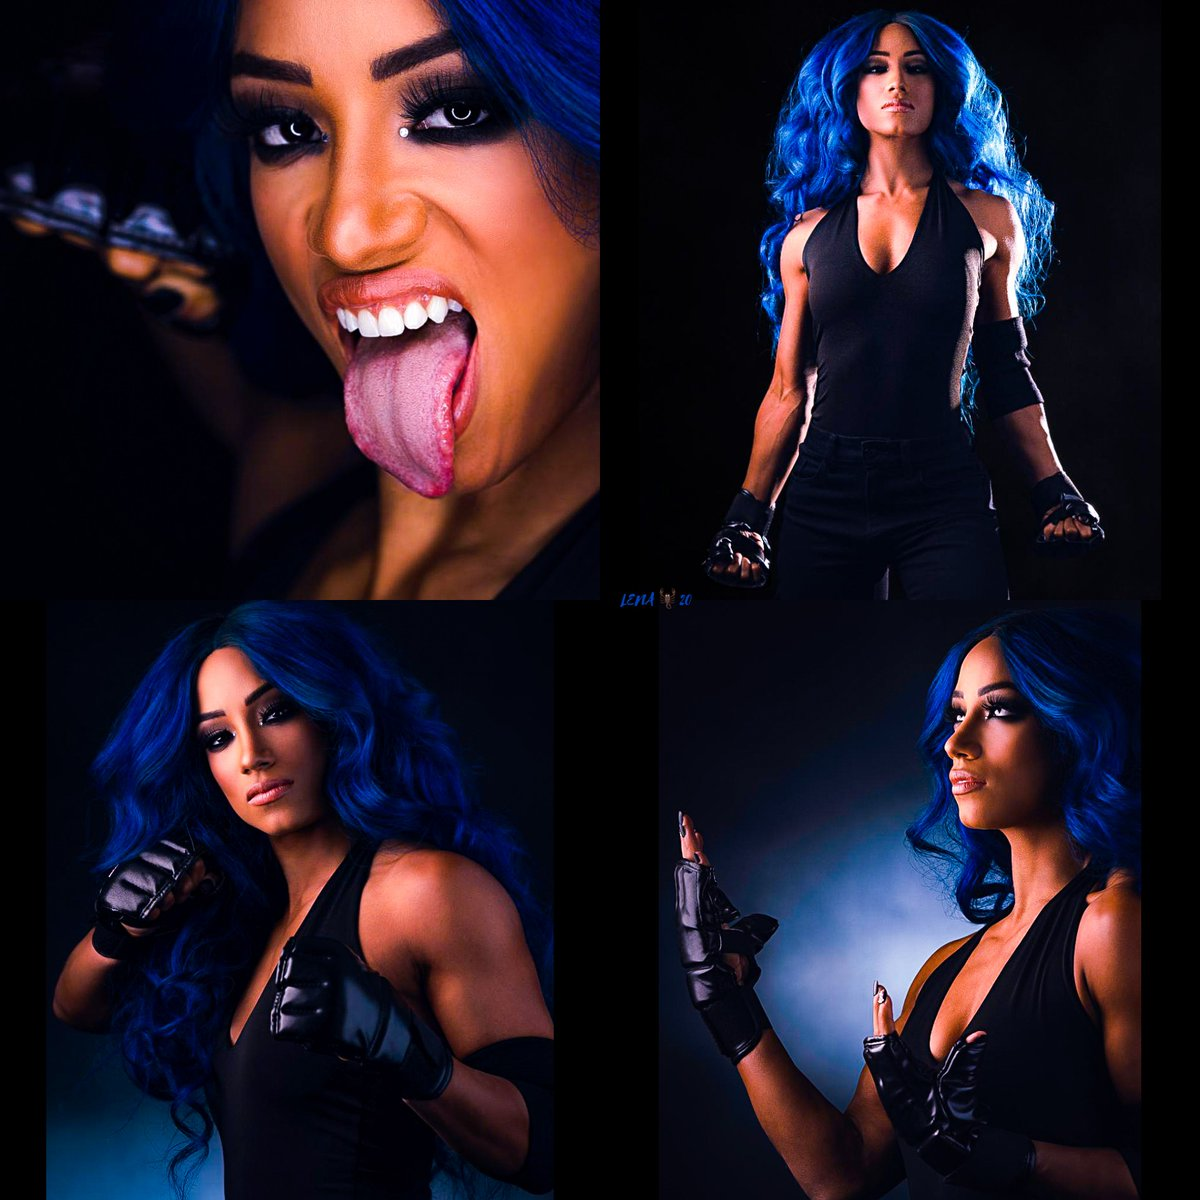 @Bex_RomSha97 @_obLIVionSquad @romshaswill @StevenF42241378 @LegitStylez_ @SashaBanksEra_ @Ambreigns13 @TwistedKing920 @SebasPunk094 @wrestling_ko THIS whole #Undertaker30  photoshoot she did was Killer and Beautifully BADA$$👌🏽💯🔥🔥💁🏽♀️👅🔥🔥💙💙